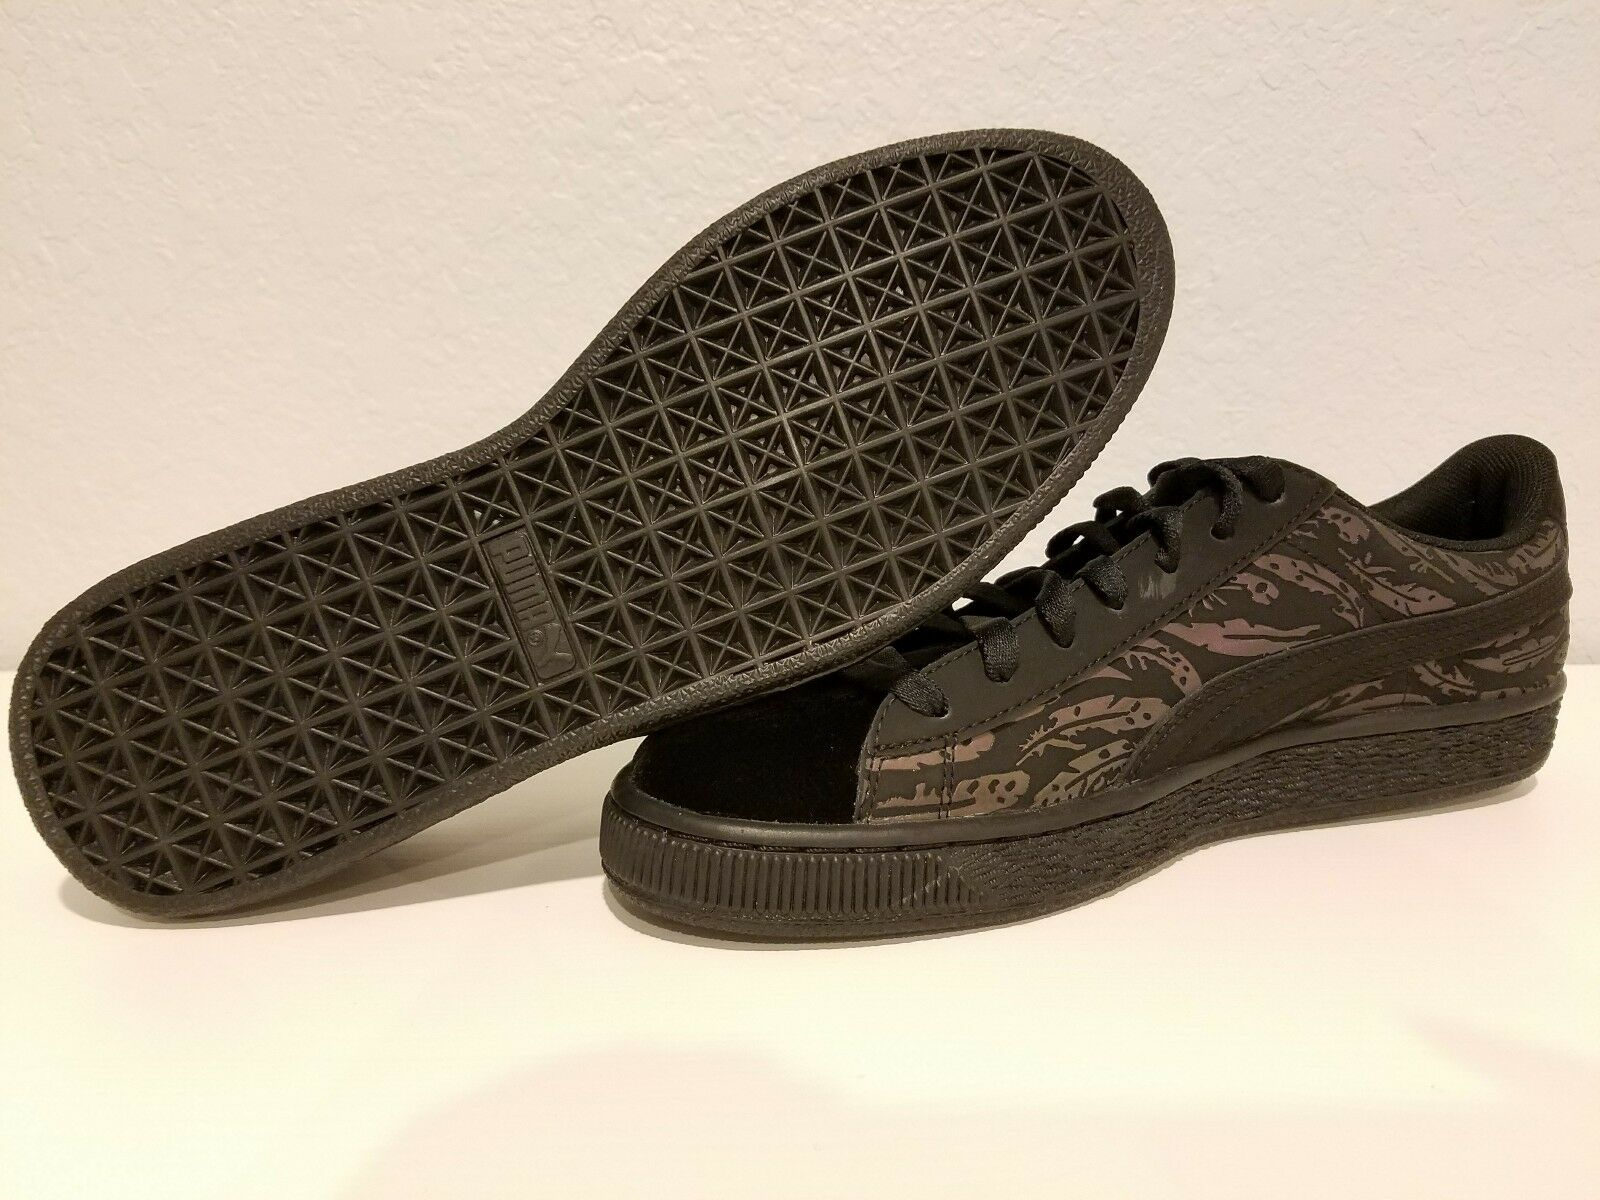 PUMA Womens Basket Swan Wns Fashion Sneaker- Size 9